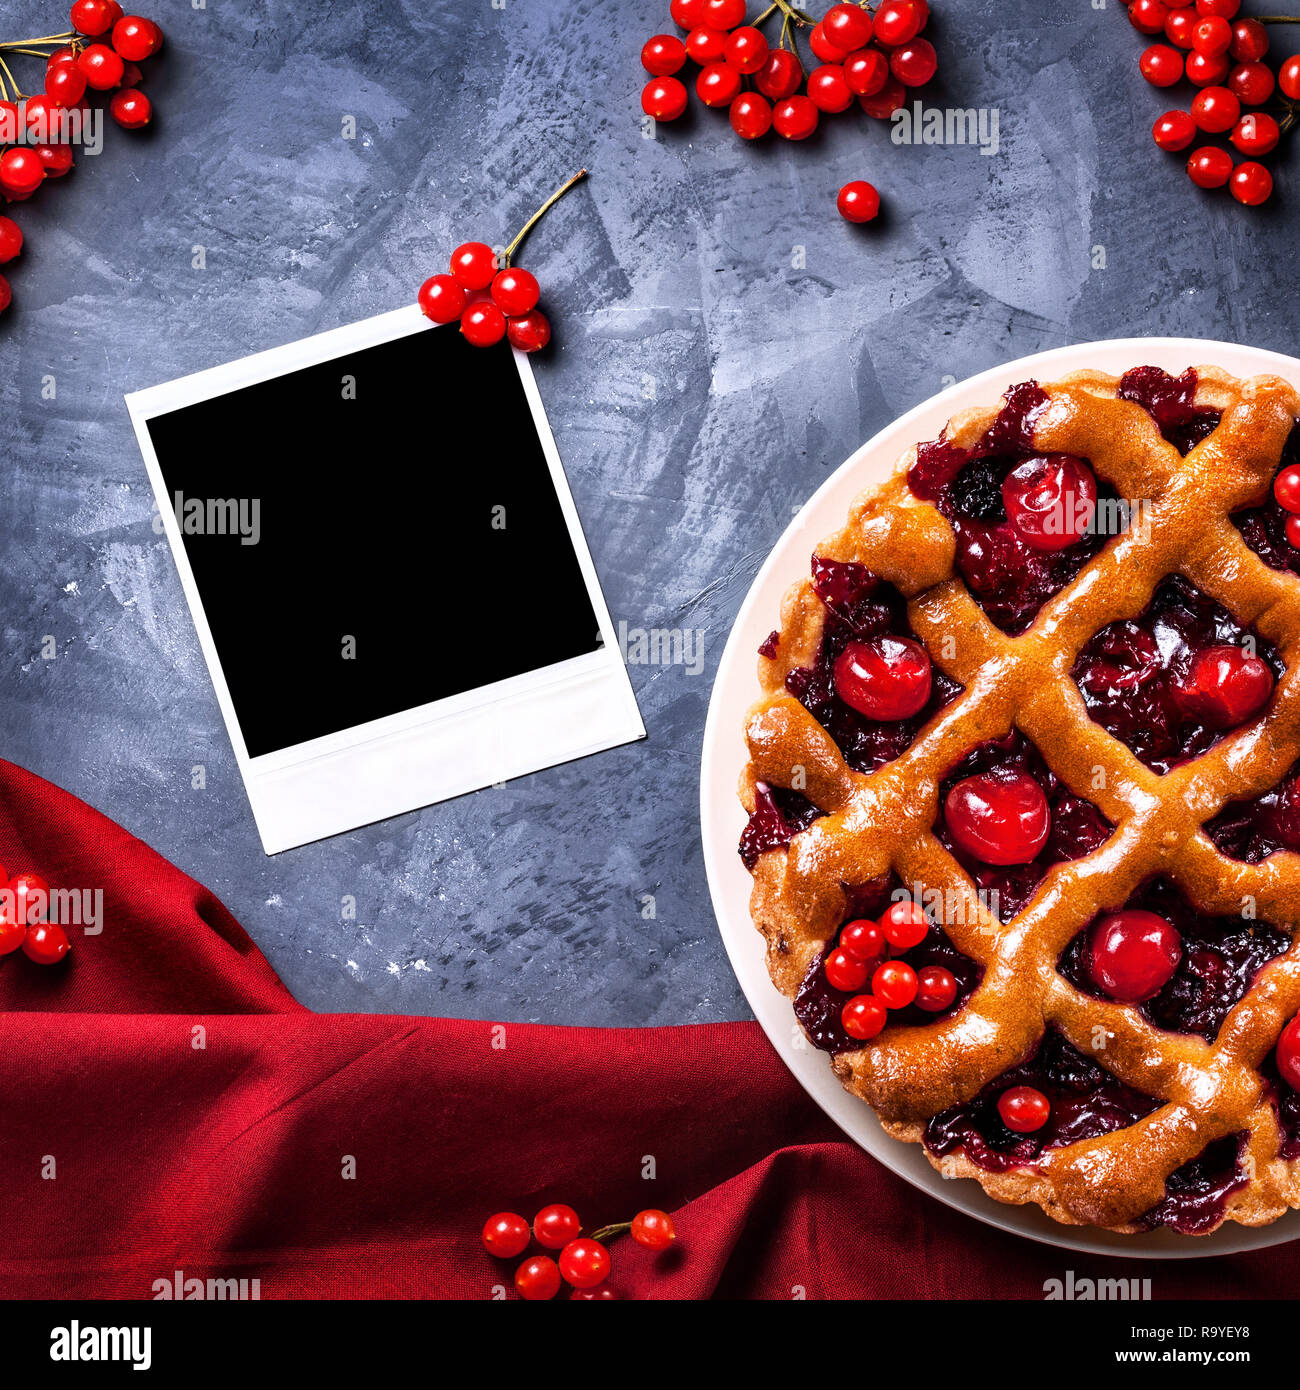 Blank photo frame near homemade cherry pie on grunge background - Stock Image